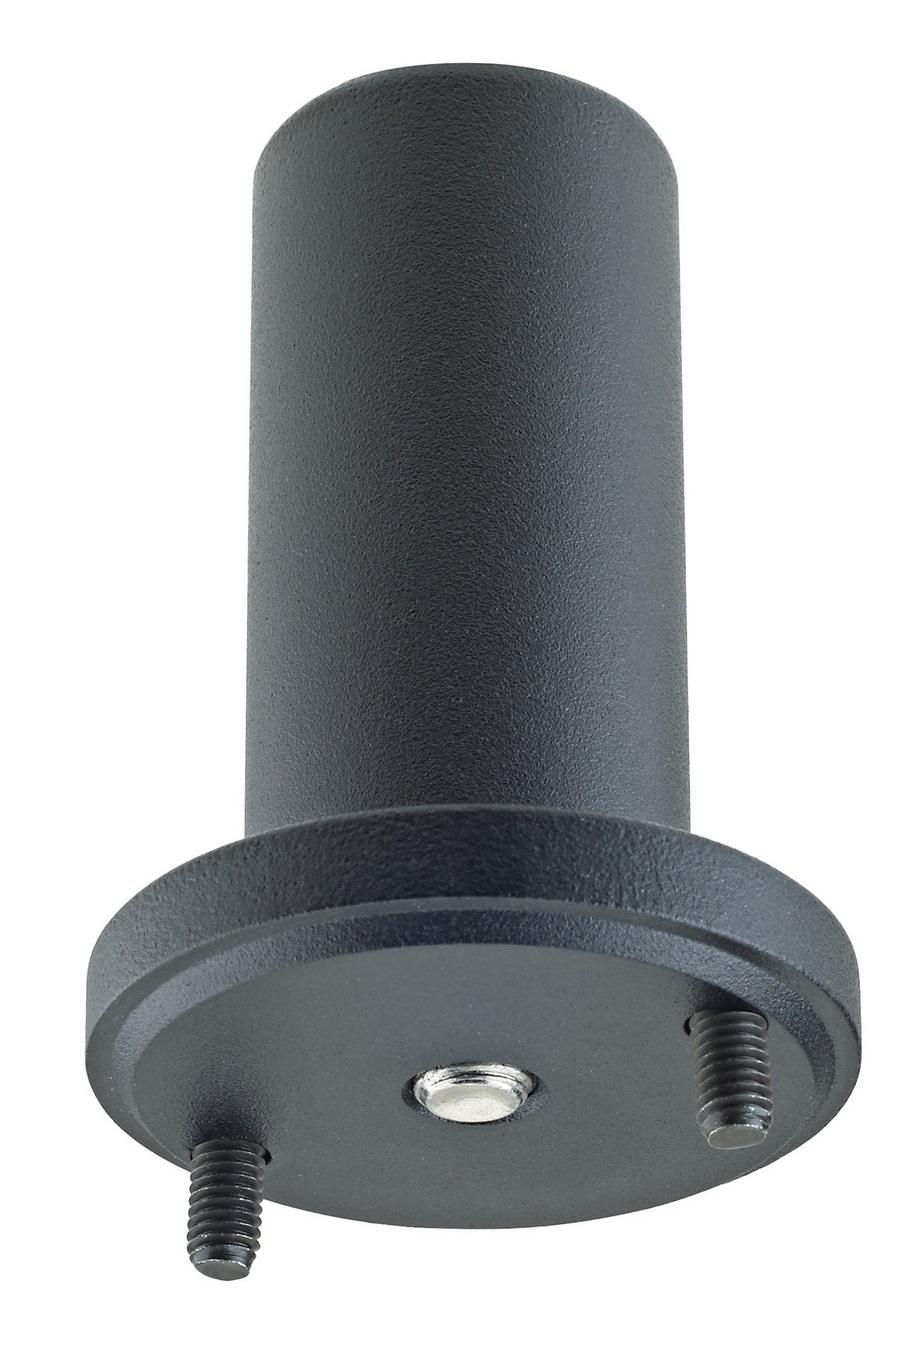 K&M 18814 Adapter